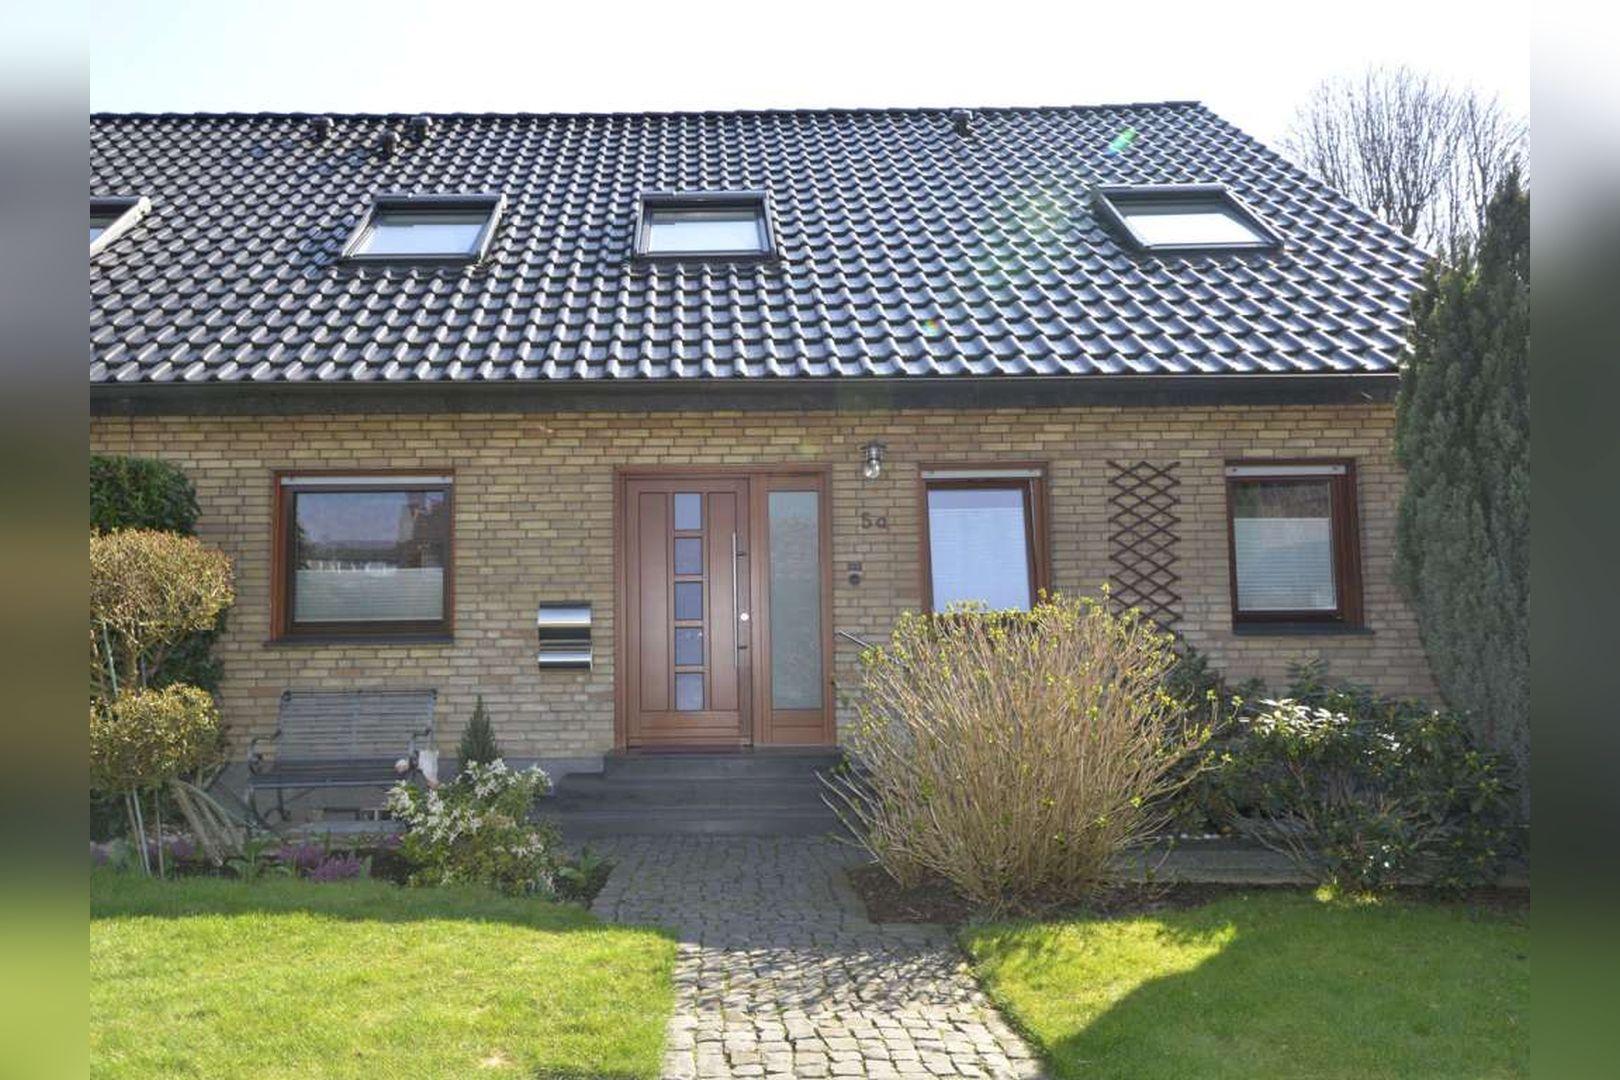 Immobilie Nr.0254 | Haselweg 5 a, 40668 Meerbusch - Bösinghoven